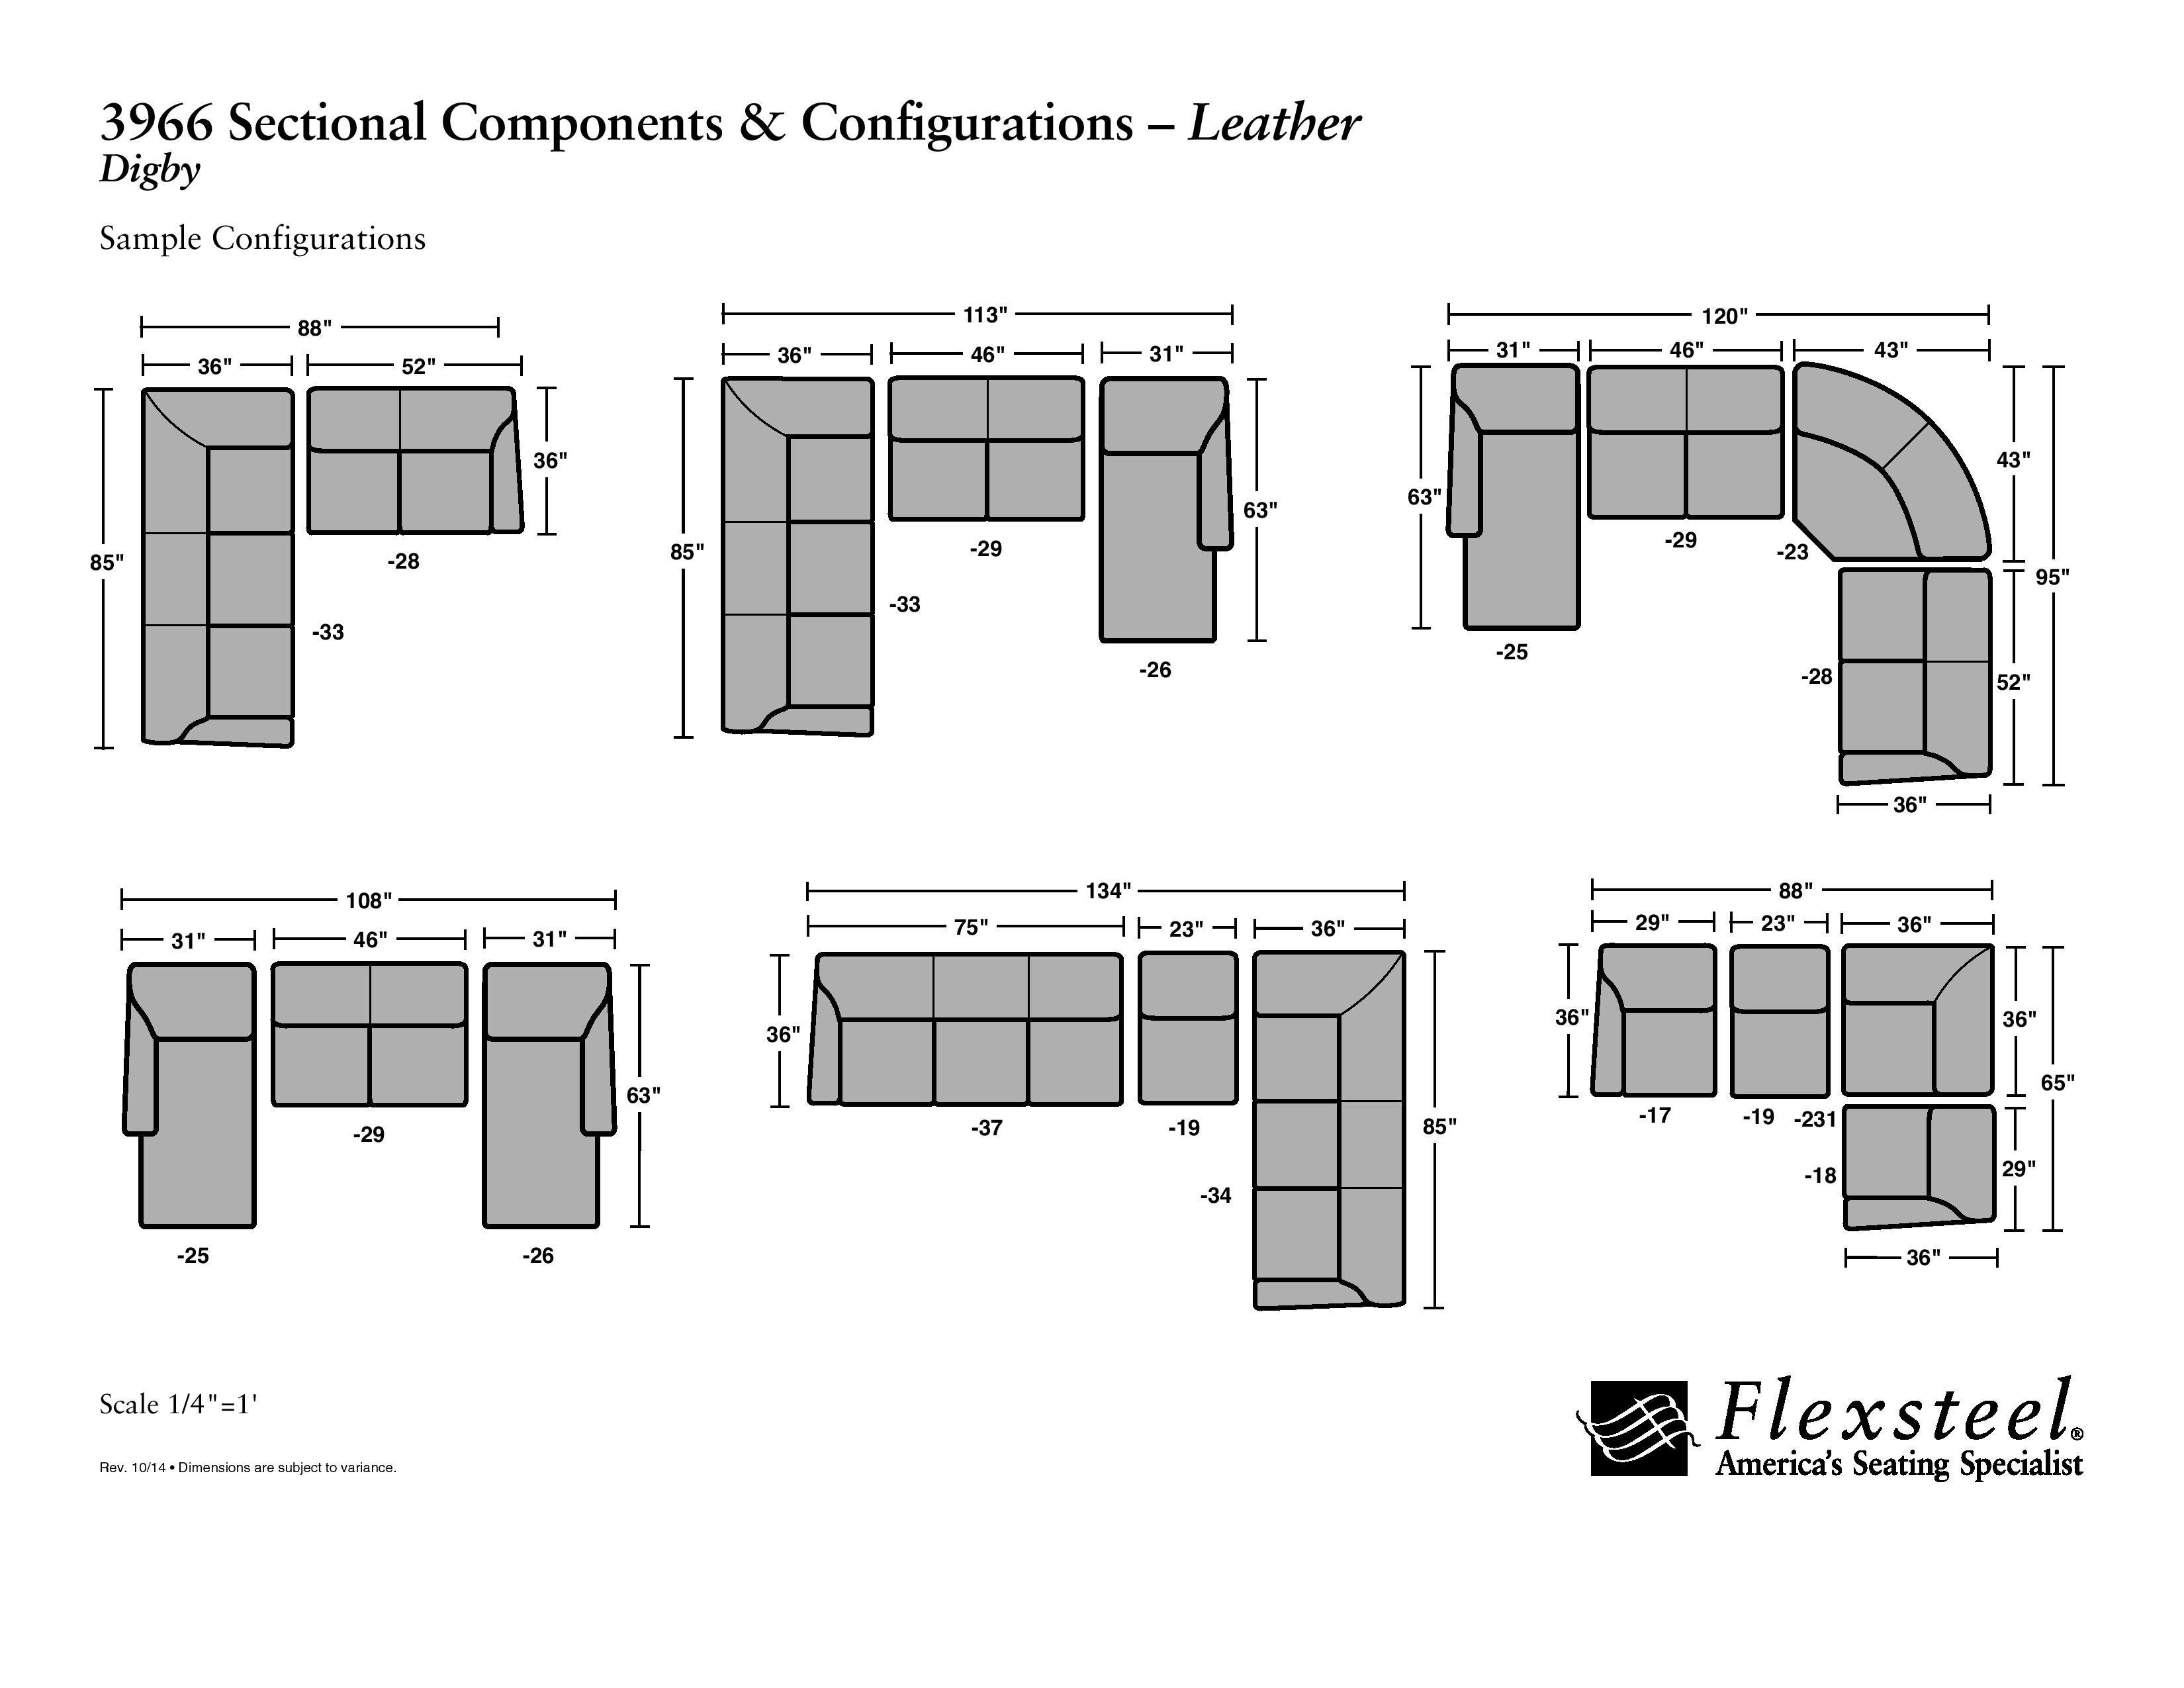 Flexsteel Digby Sectional Specs Google Search Flexsteel Basement Remodeling Living Room Grey